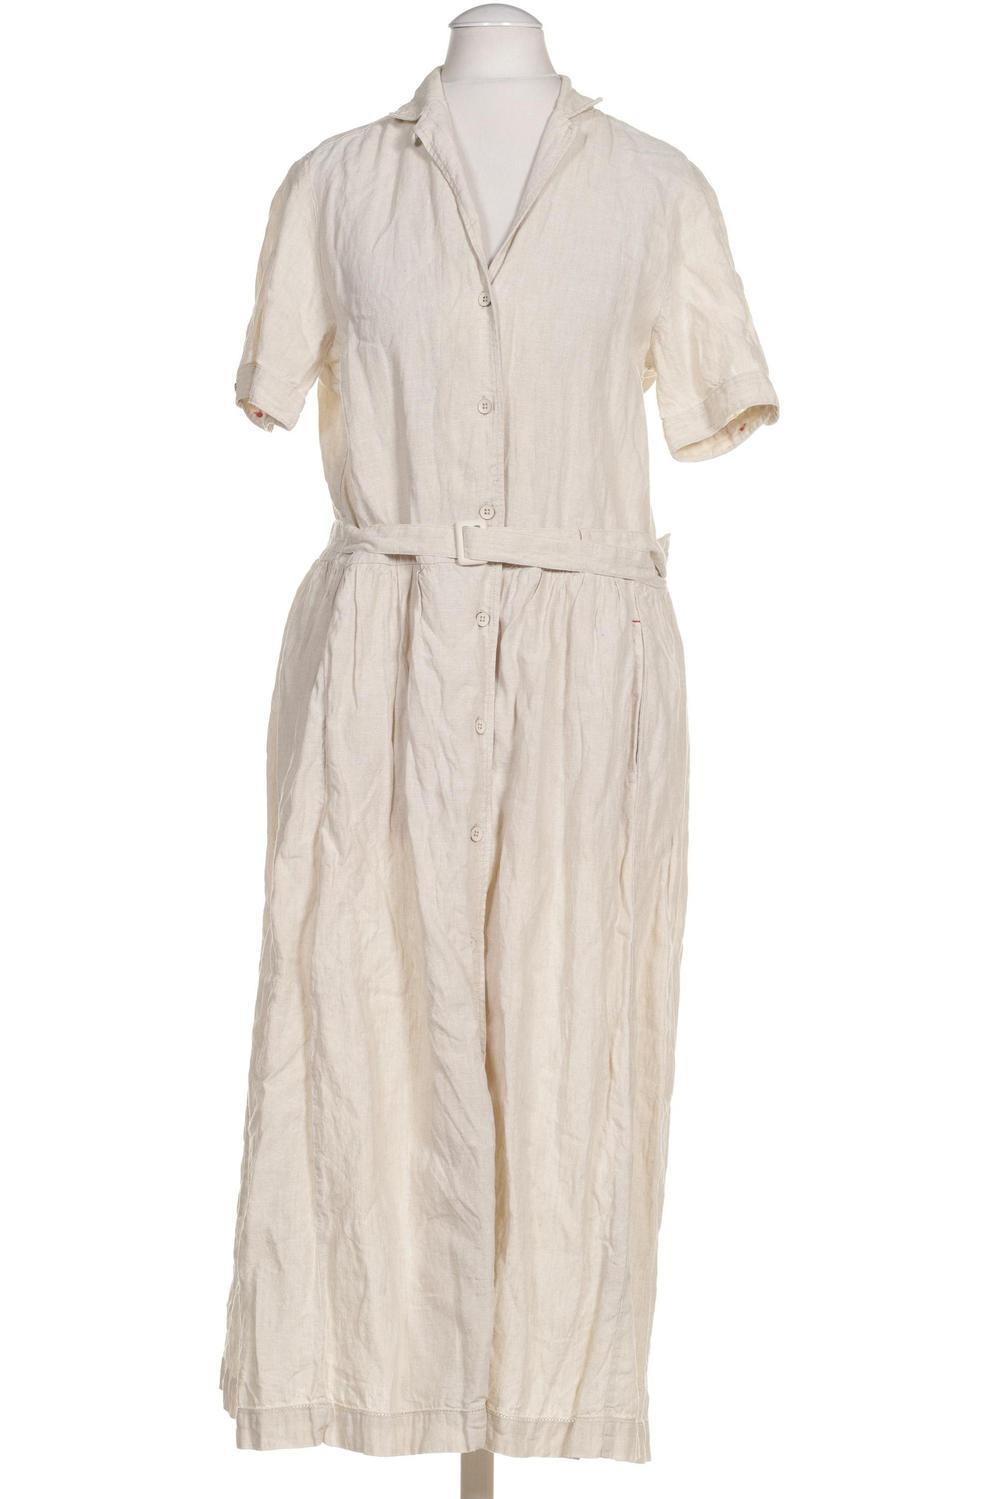 uniqlo kleid damen dress damenkleid gr. s leinen beige